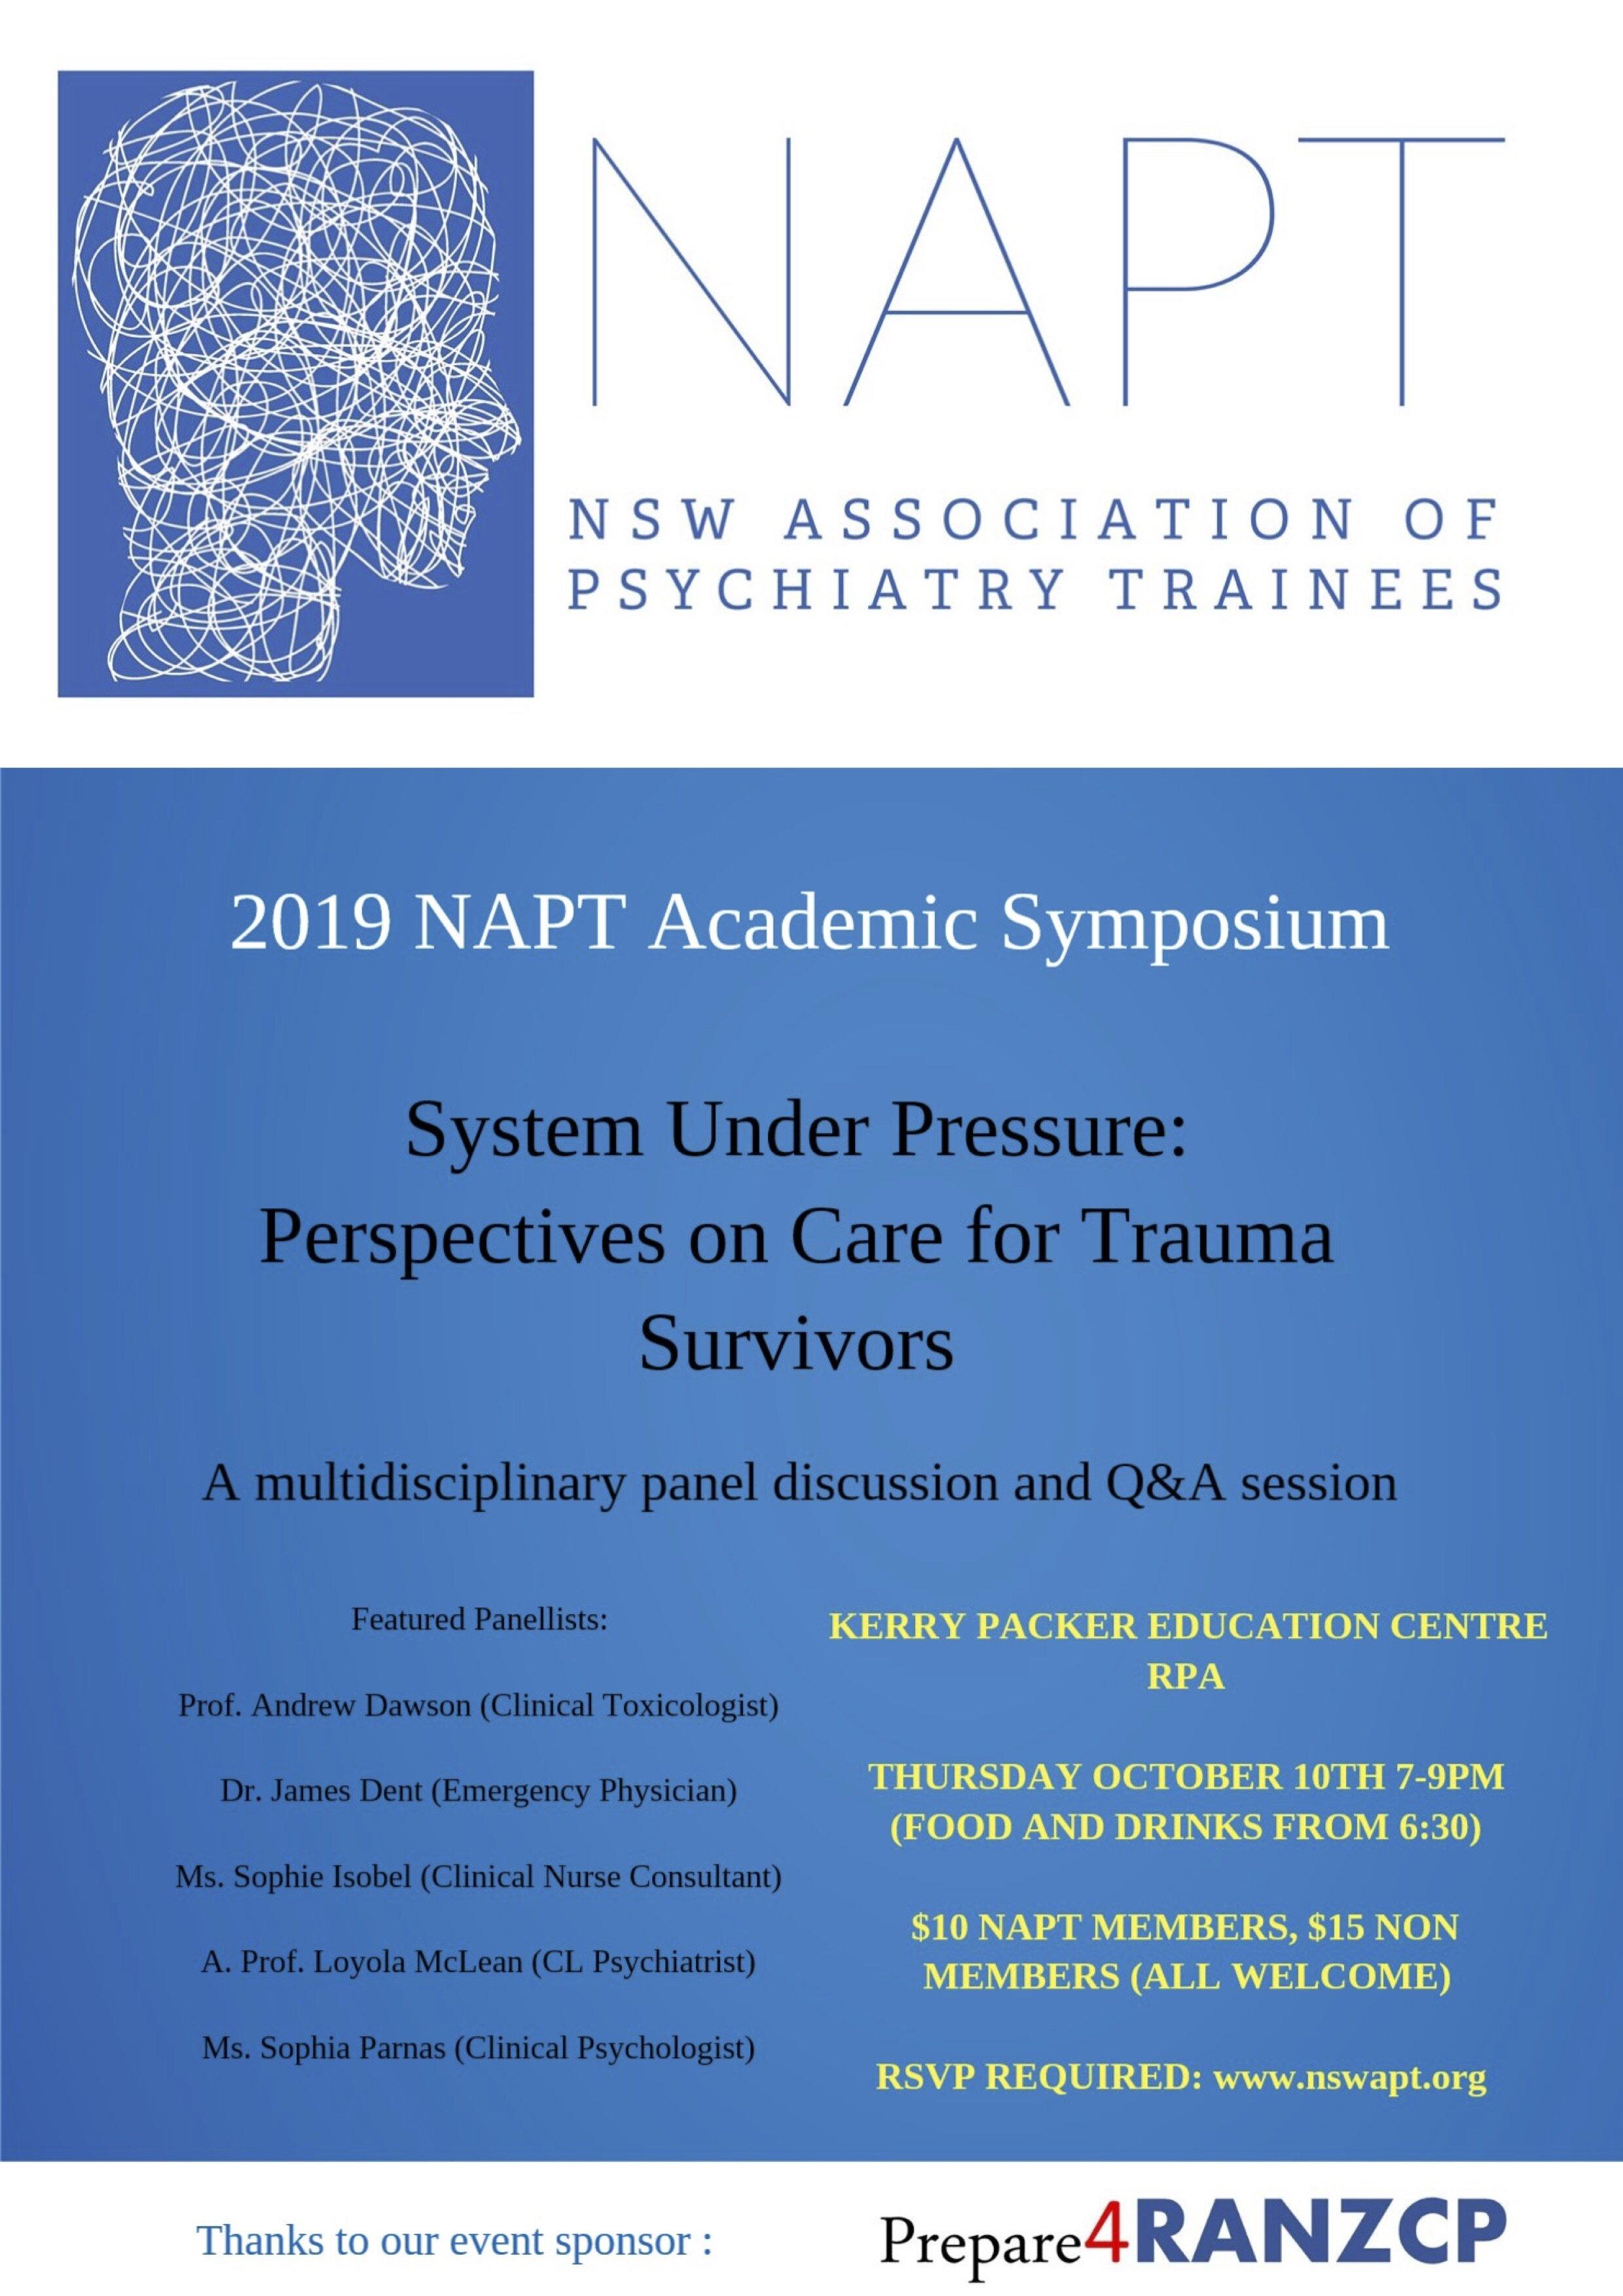 NAPT 2019 Academic Symposium.jpg